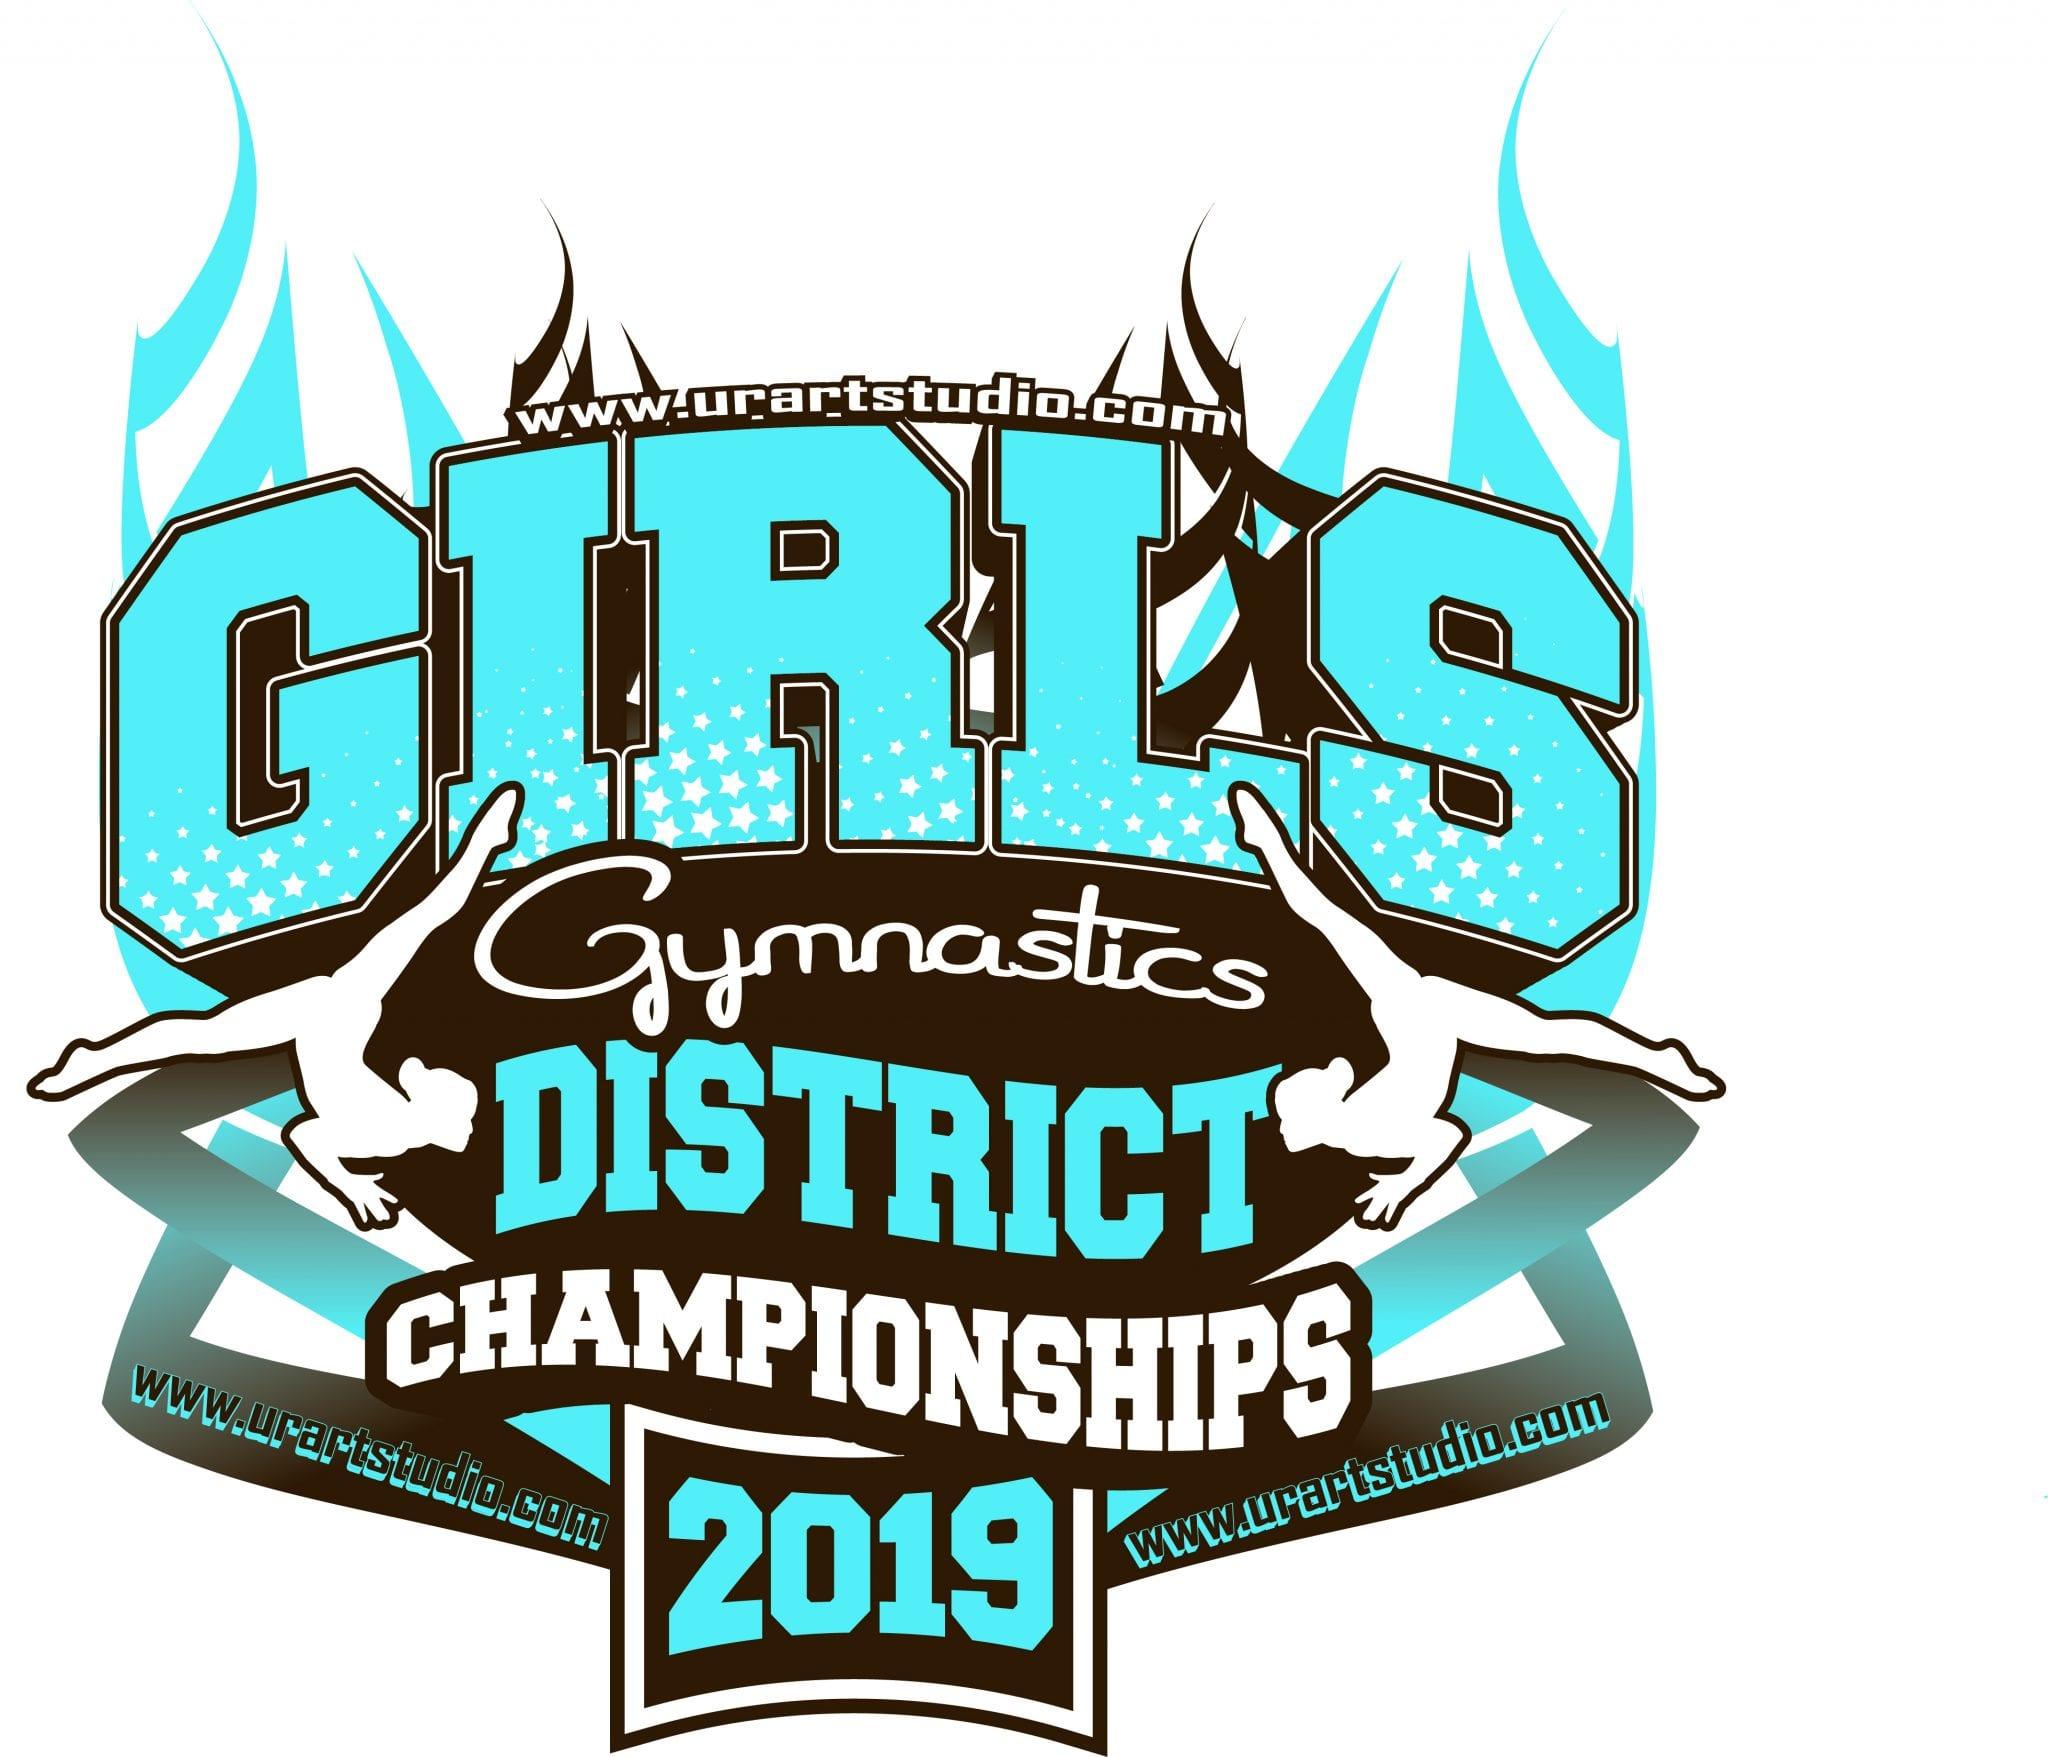 GIRLS GYMNASTICS DISTRICT CHAMPIONSHIPS customizable T-shirt vector logo design for print 2019